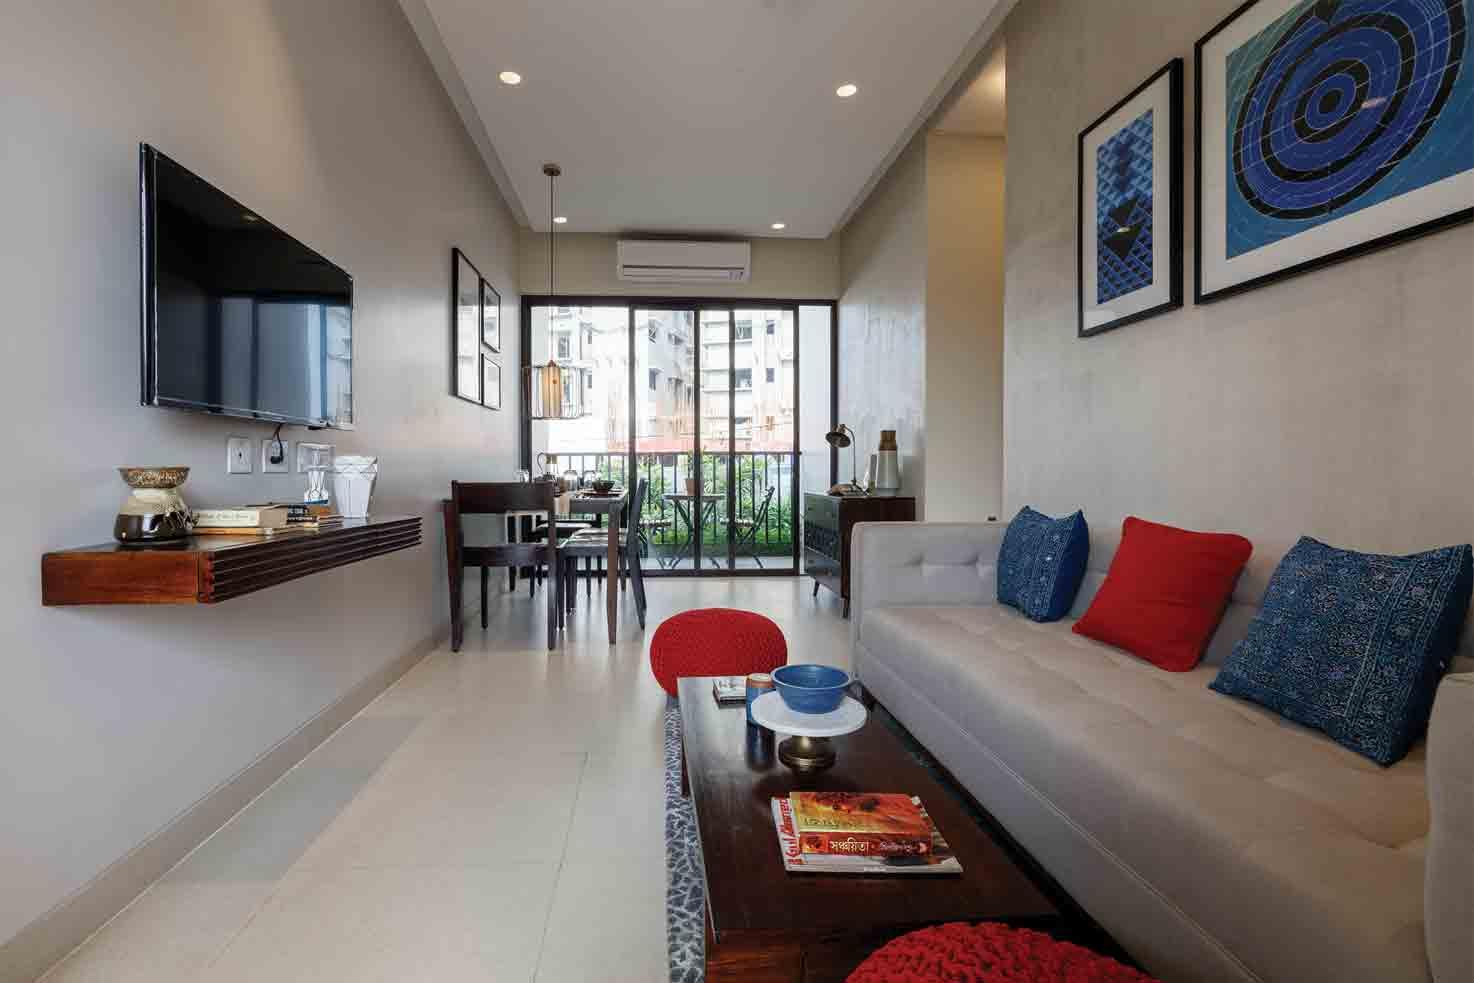 Residential Apartments in Joka